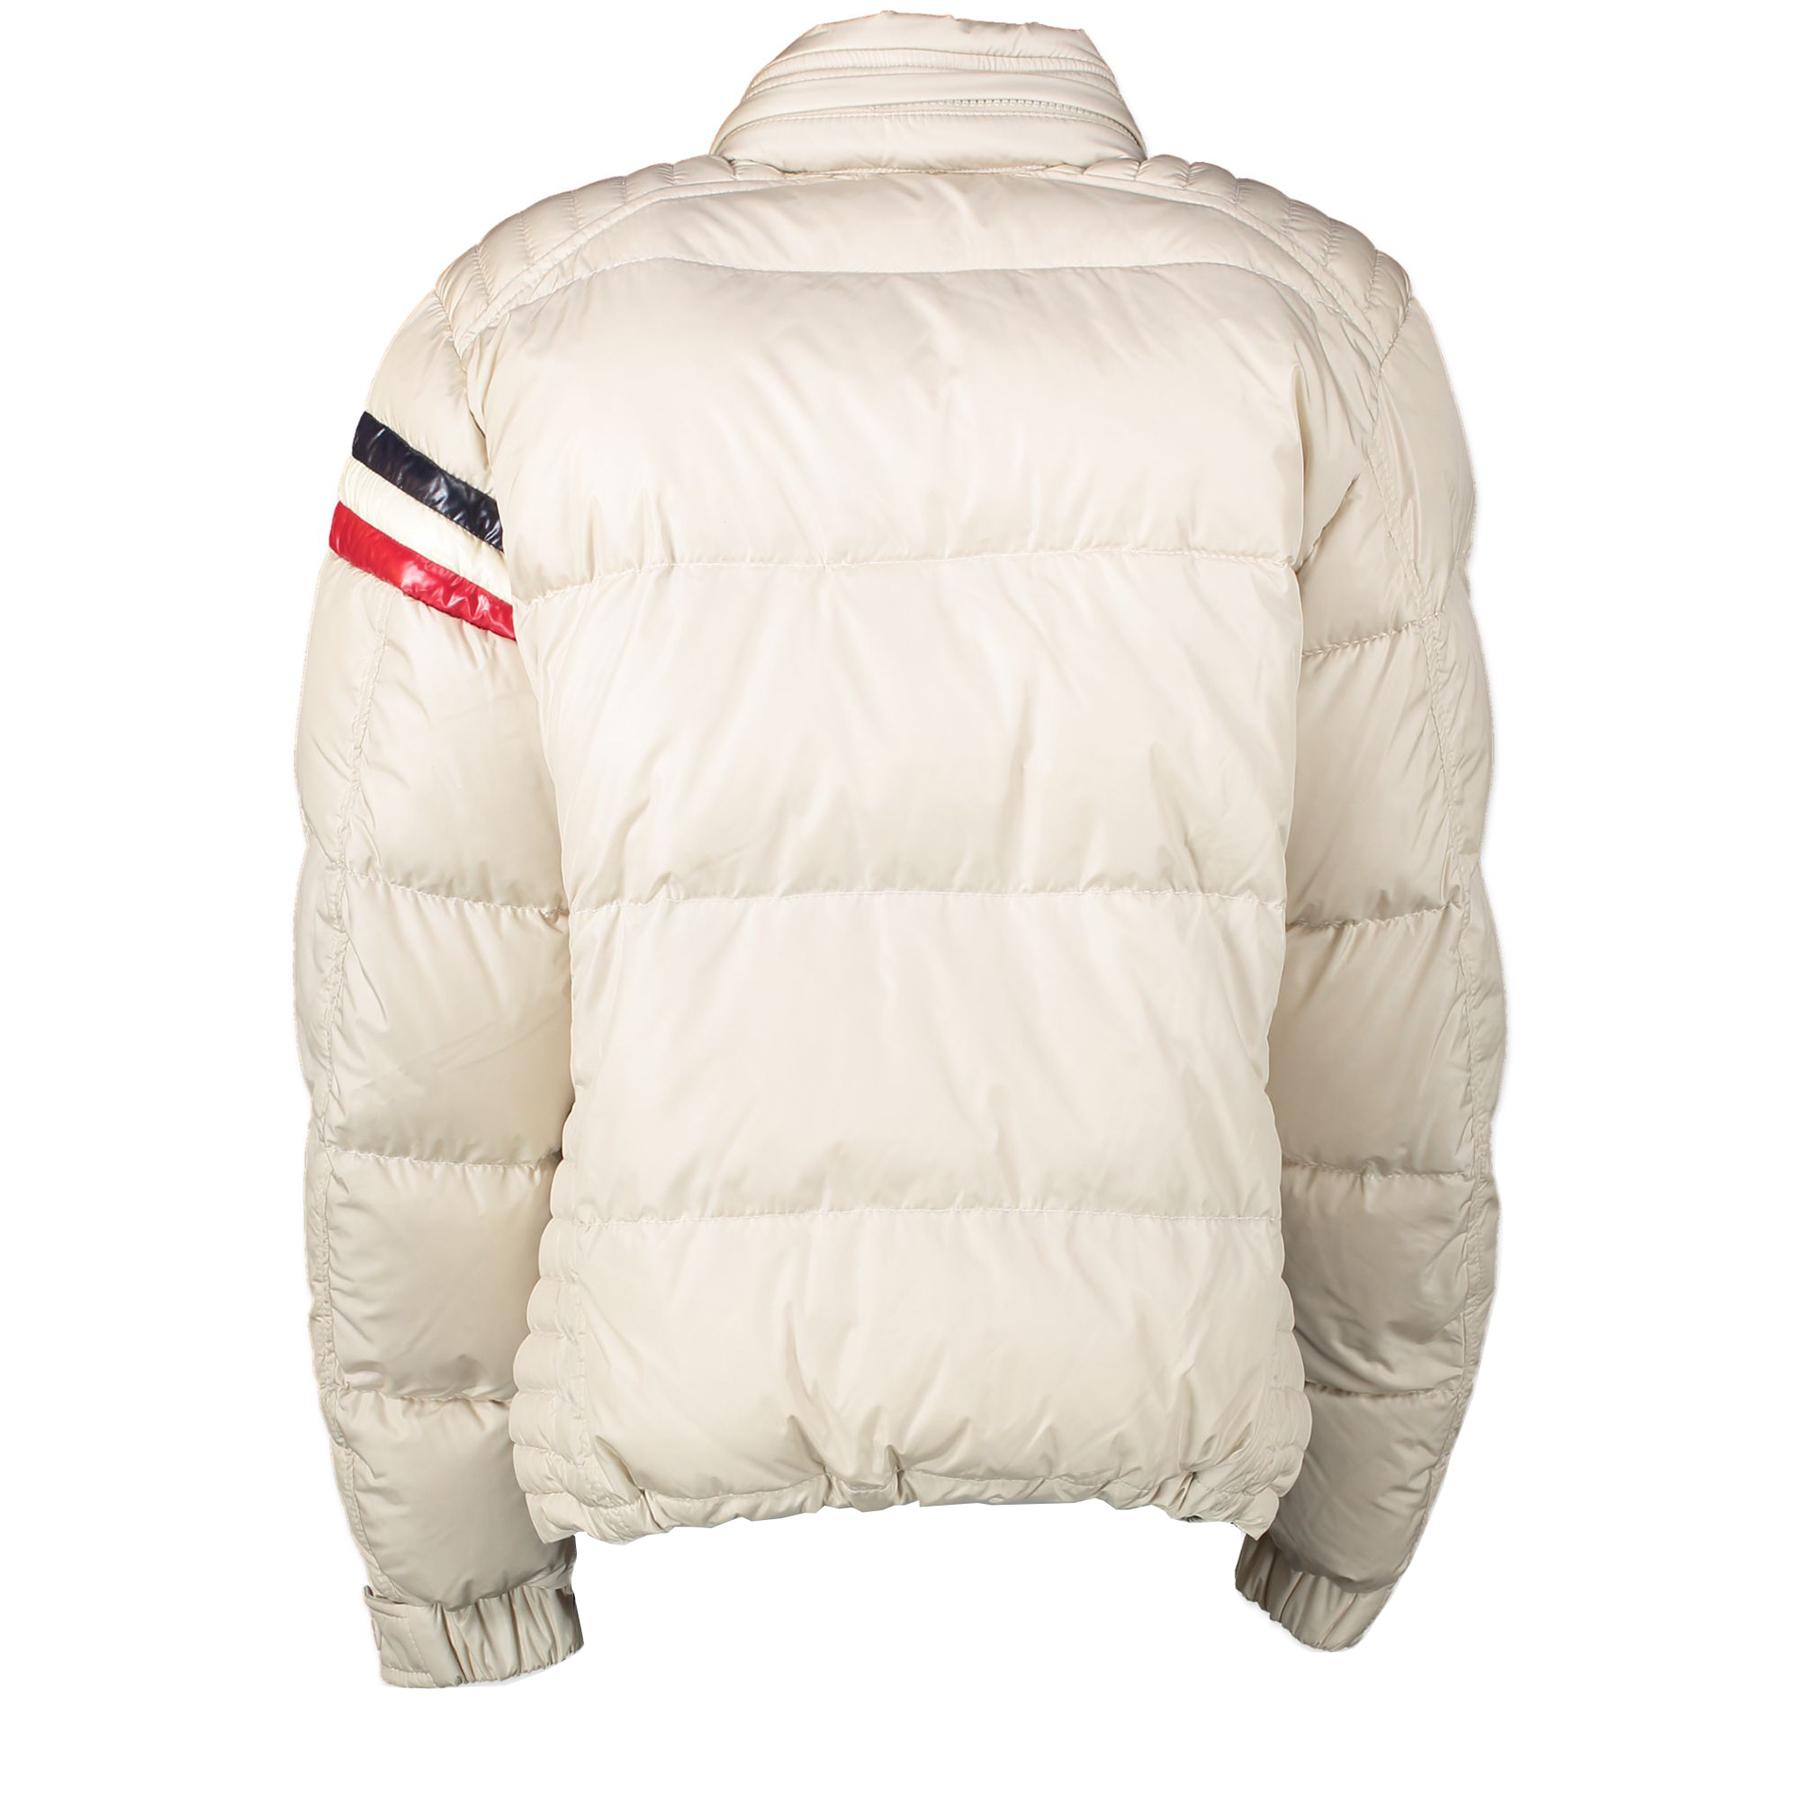 Authentieke Tweedehands Moncler Eggshell White Puffer Ski Jacket - Size 1 juiste prijs veilig online shoppen luxe merken webshop winkelen Antwerpen België mode fashion